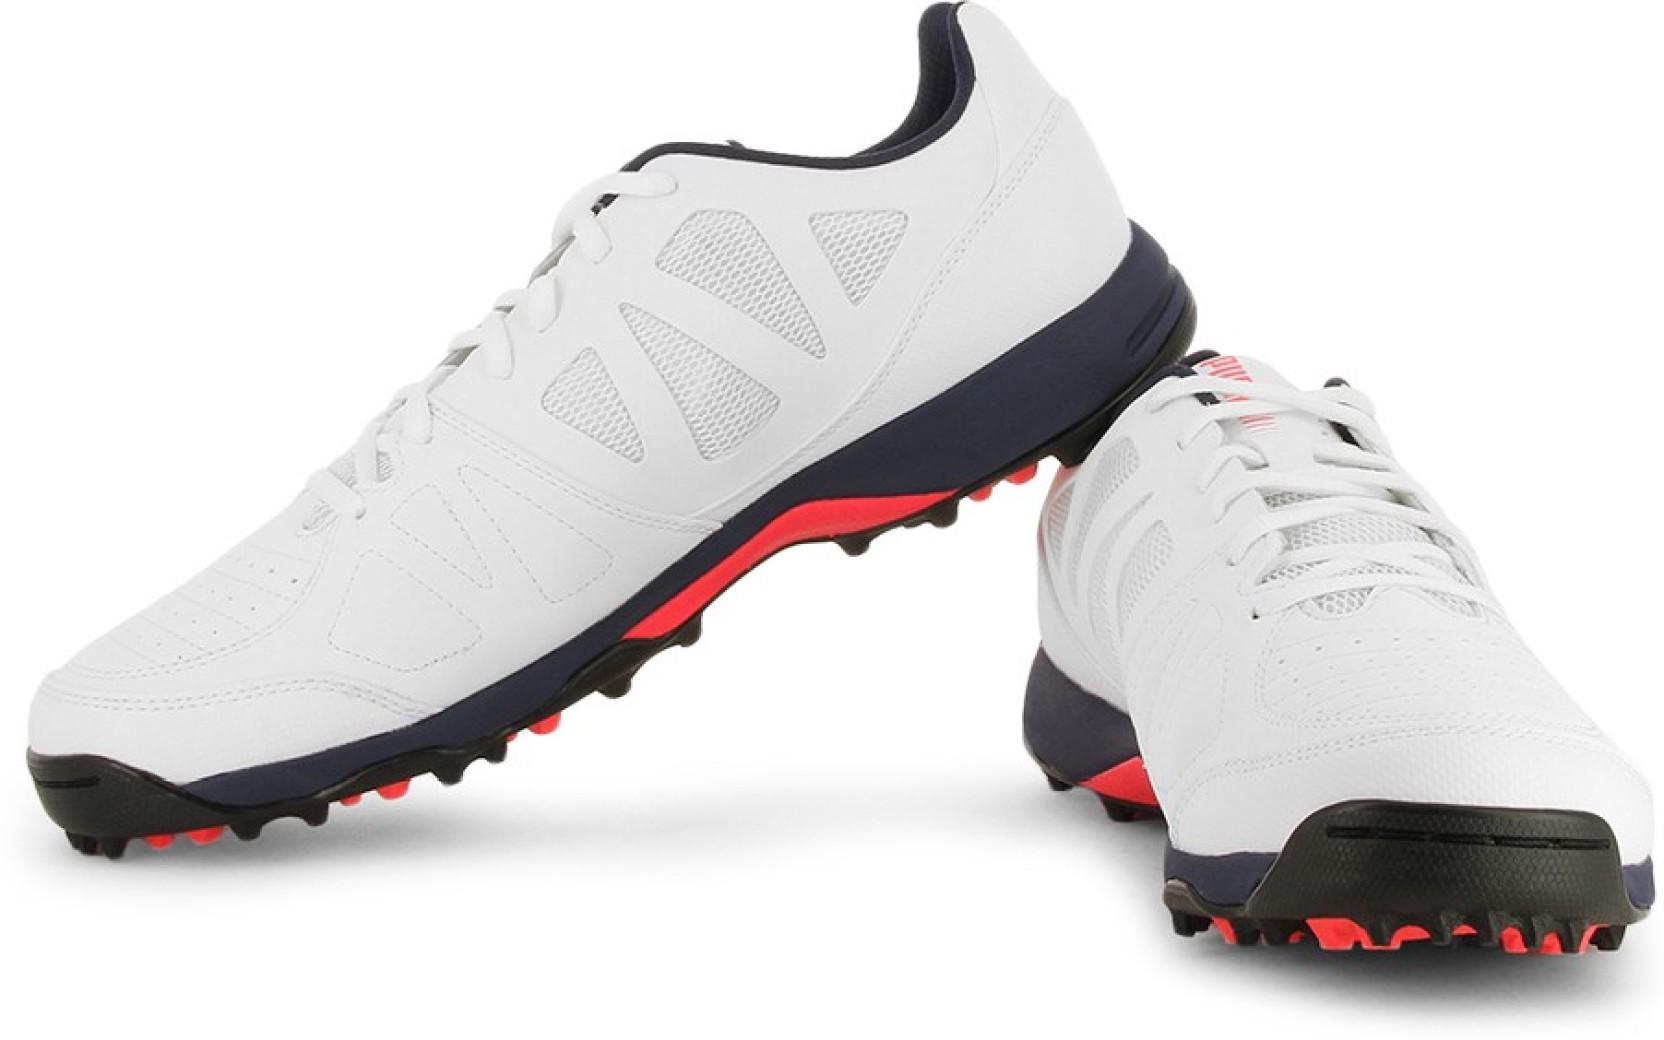 Puma Evospeed   Cricket Shoes Price